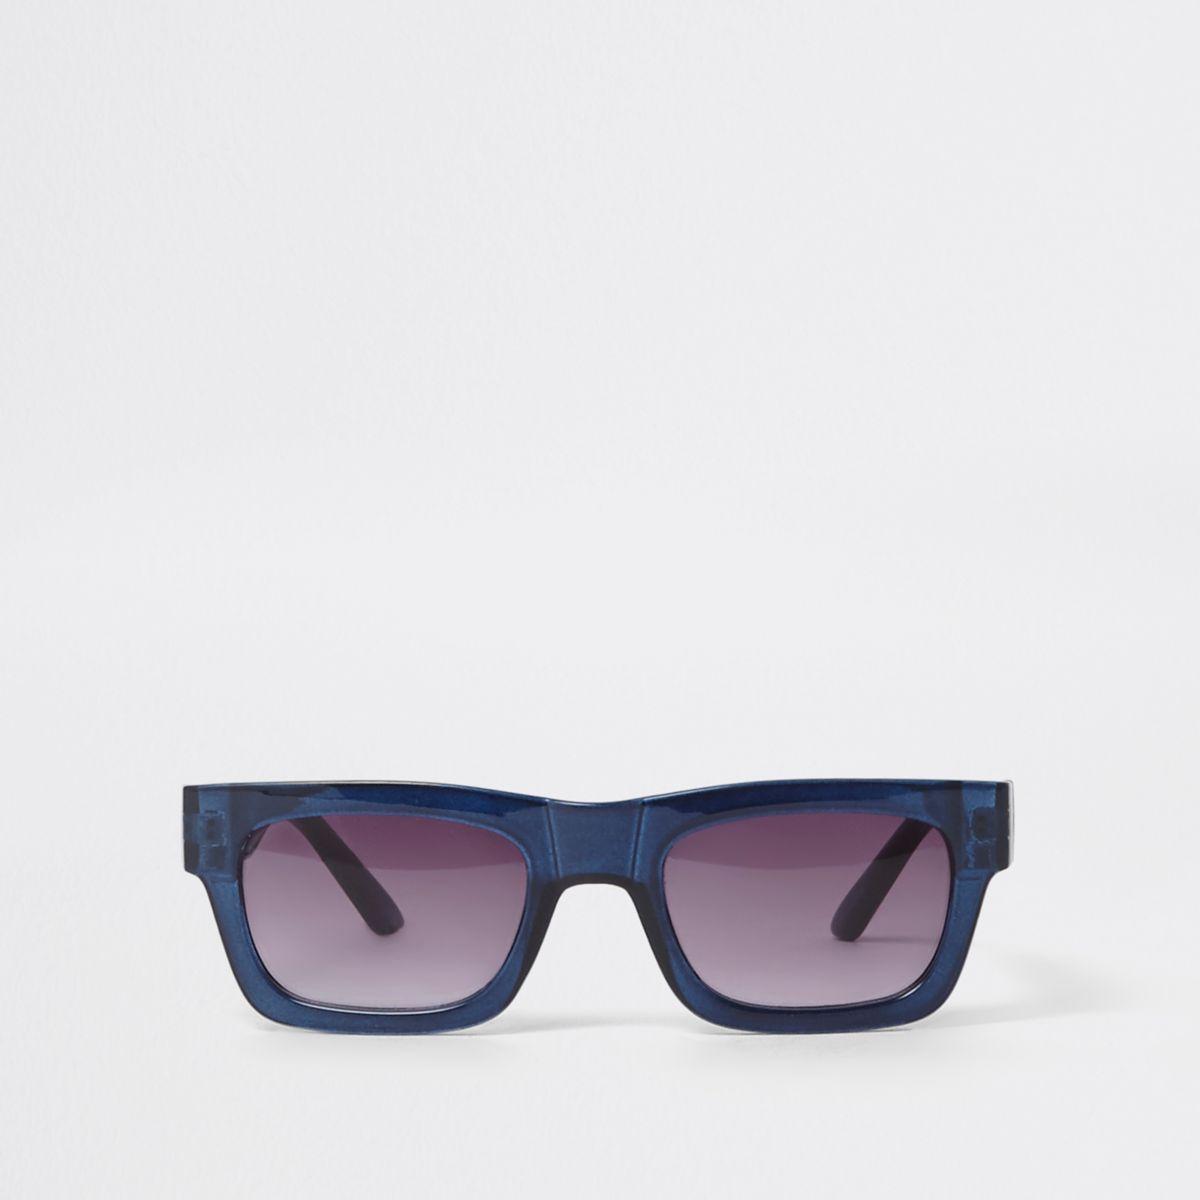 Blauwe retro zonnebril met getinte glazen